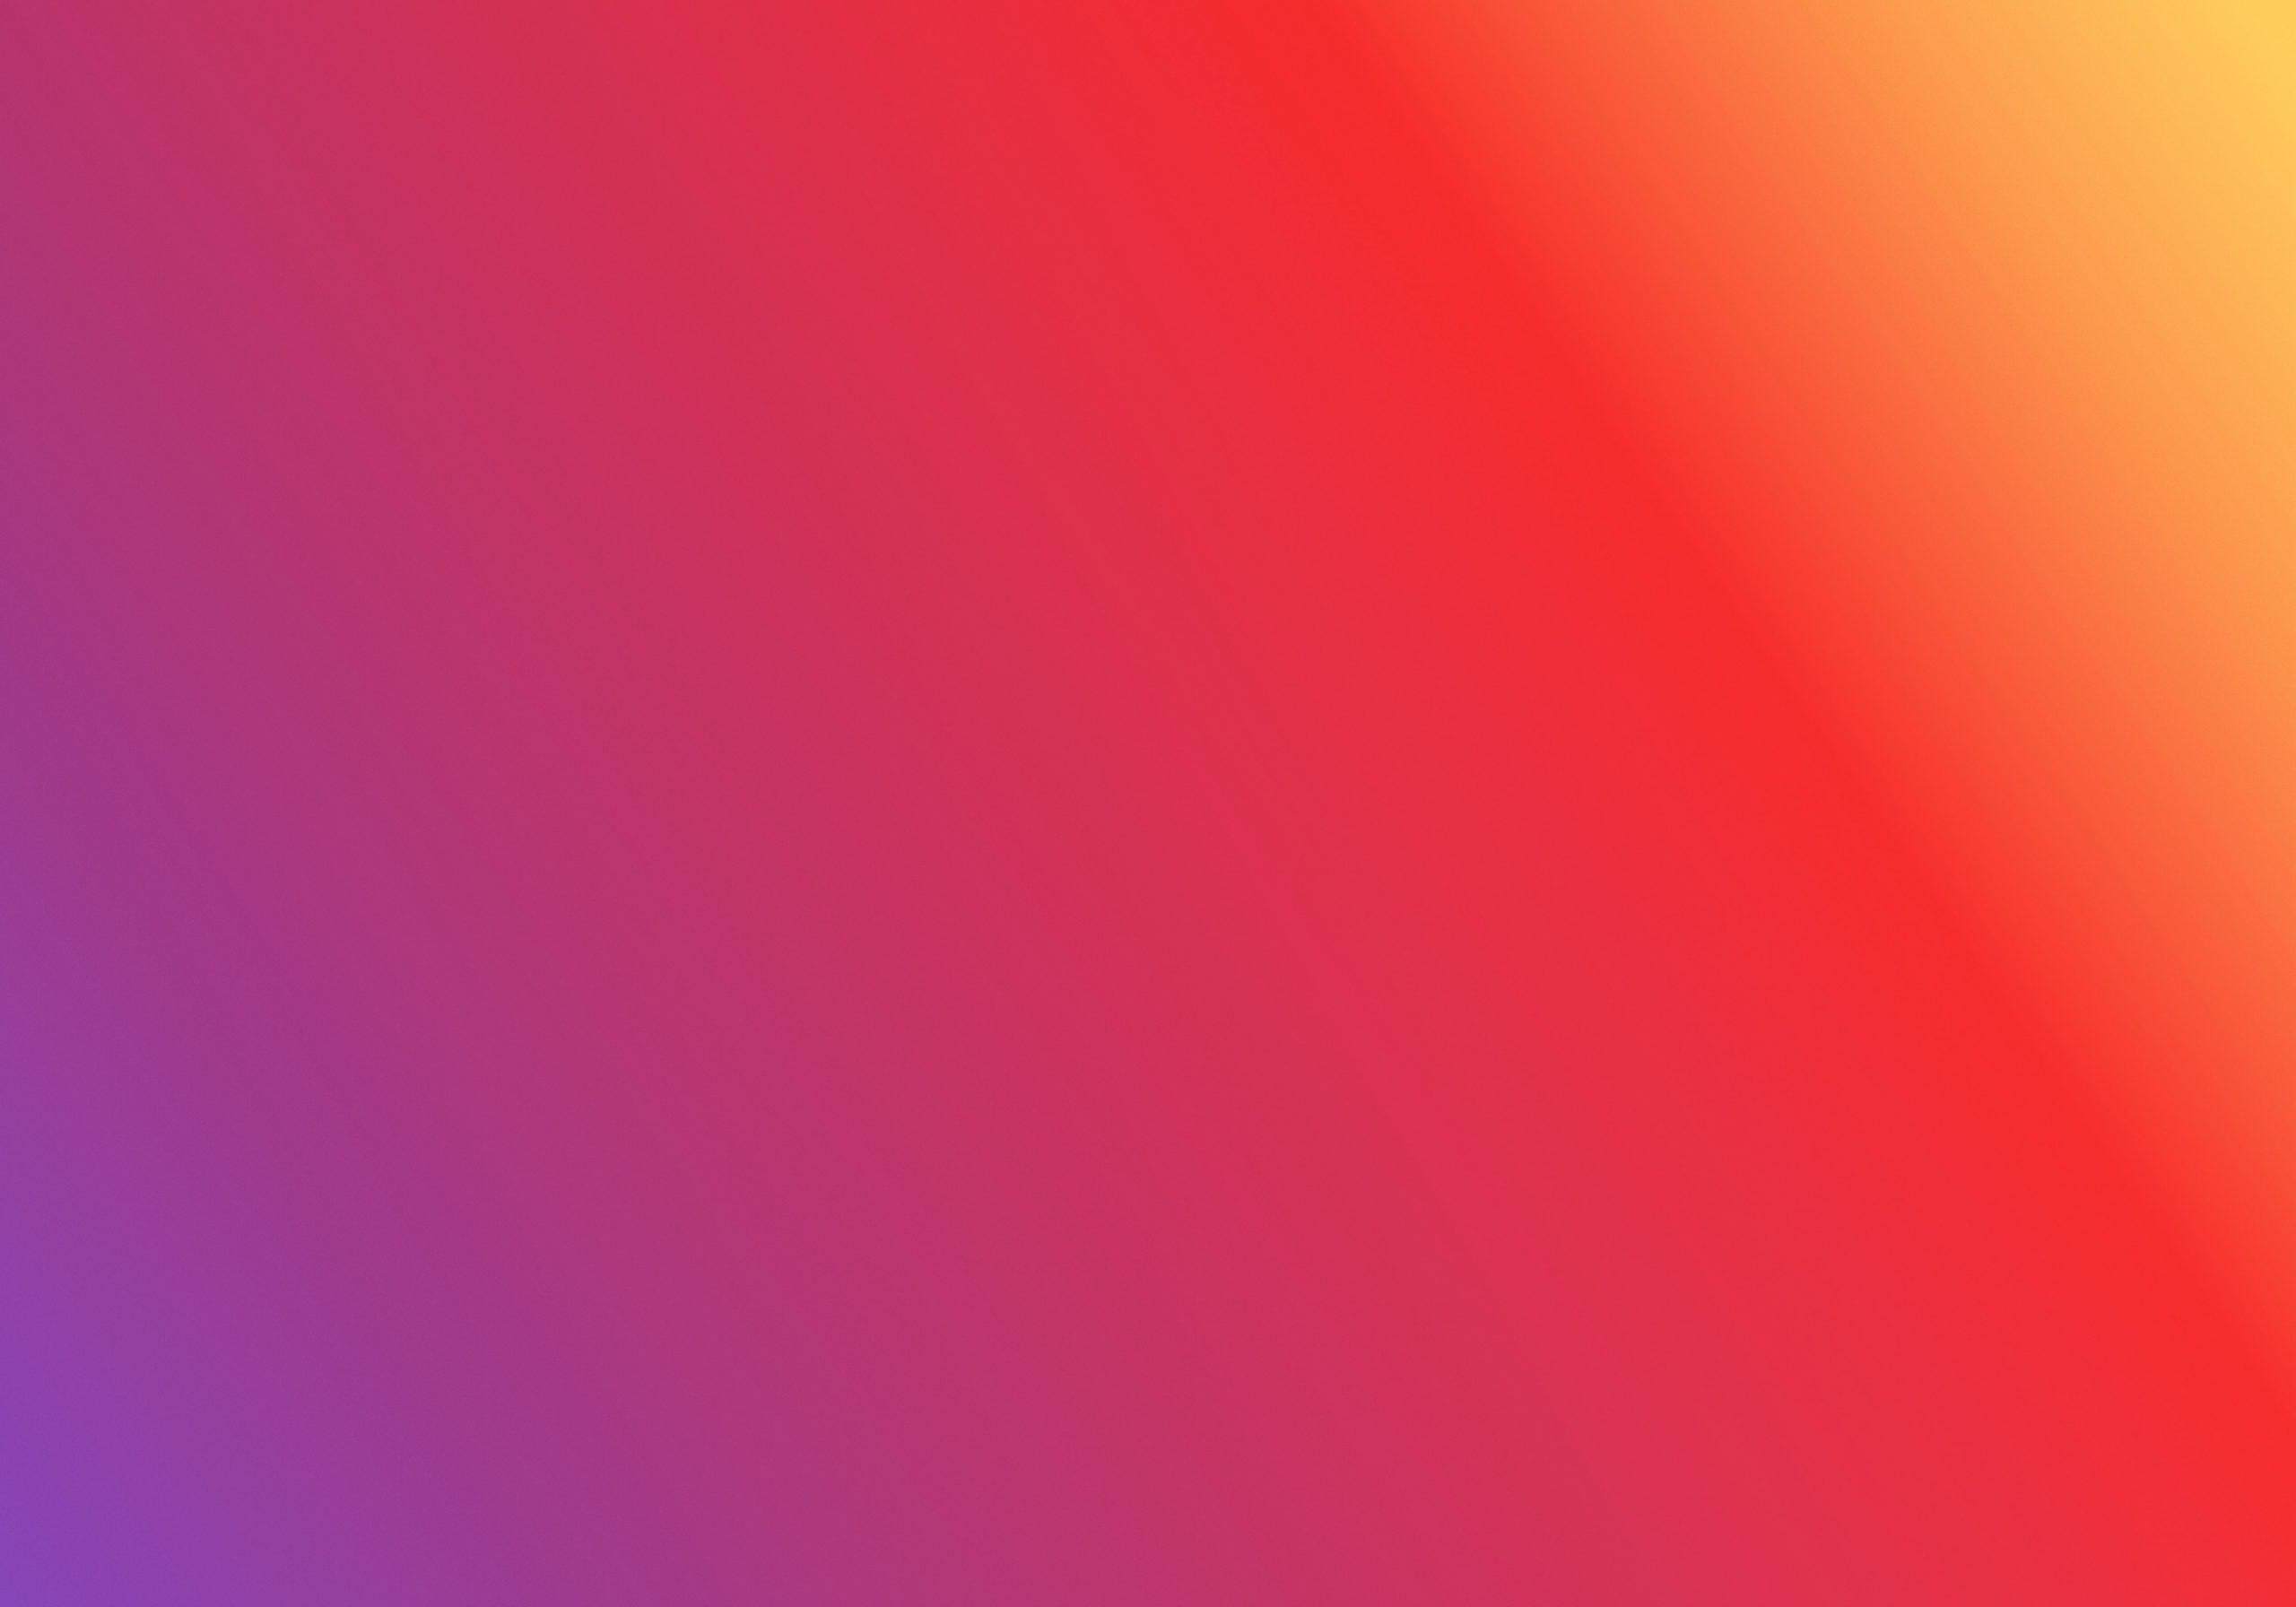 IG colors